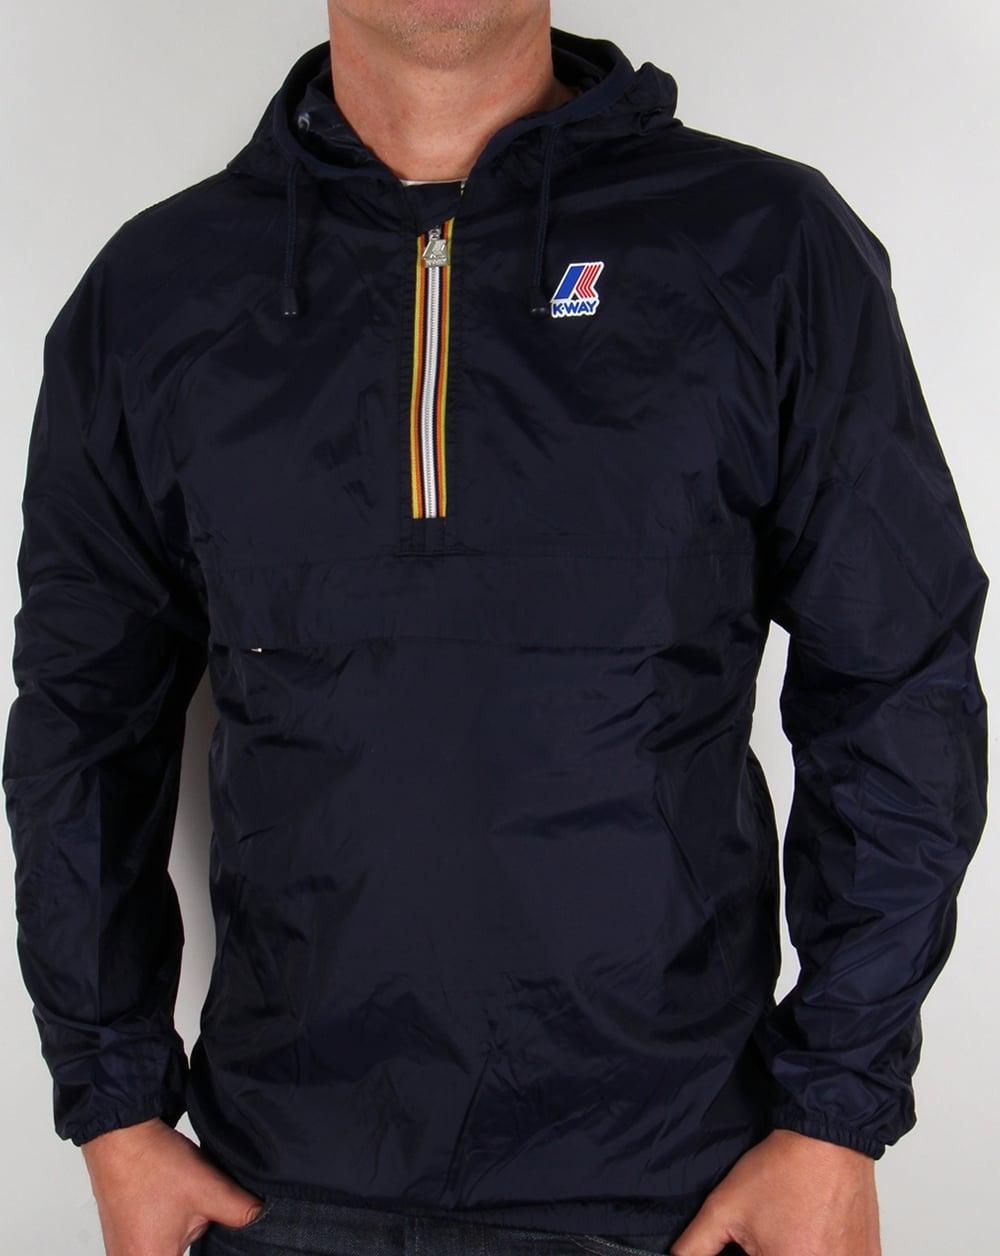 k way leon half zip rainproof jacket navy coat pac a mac mens. Black Bedroom Furniture Sets. Home Design Ideas